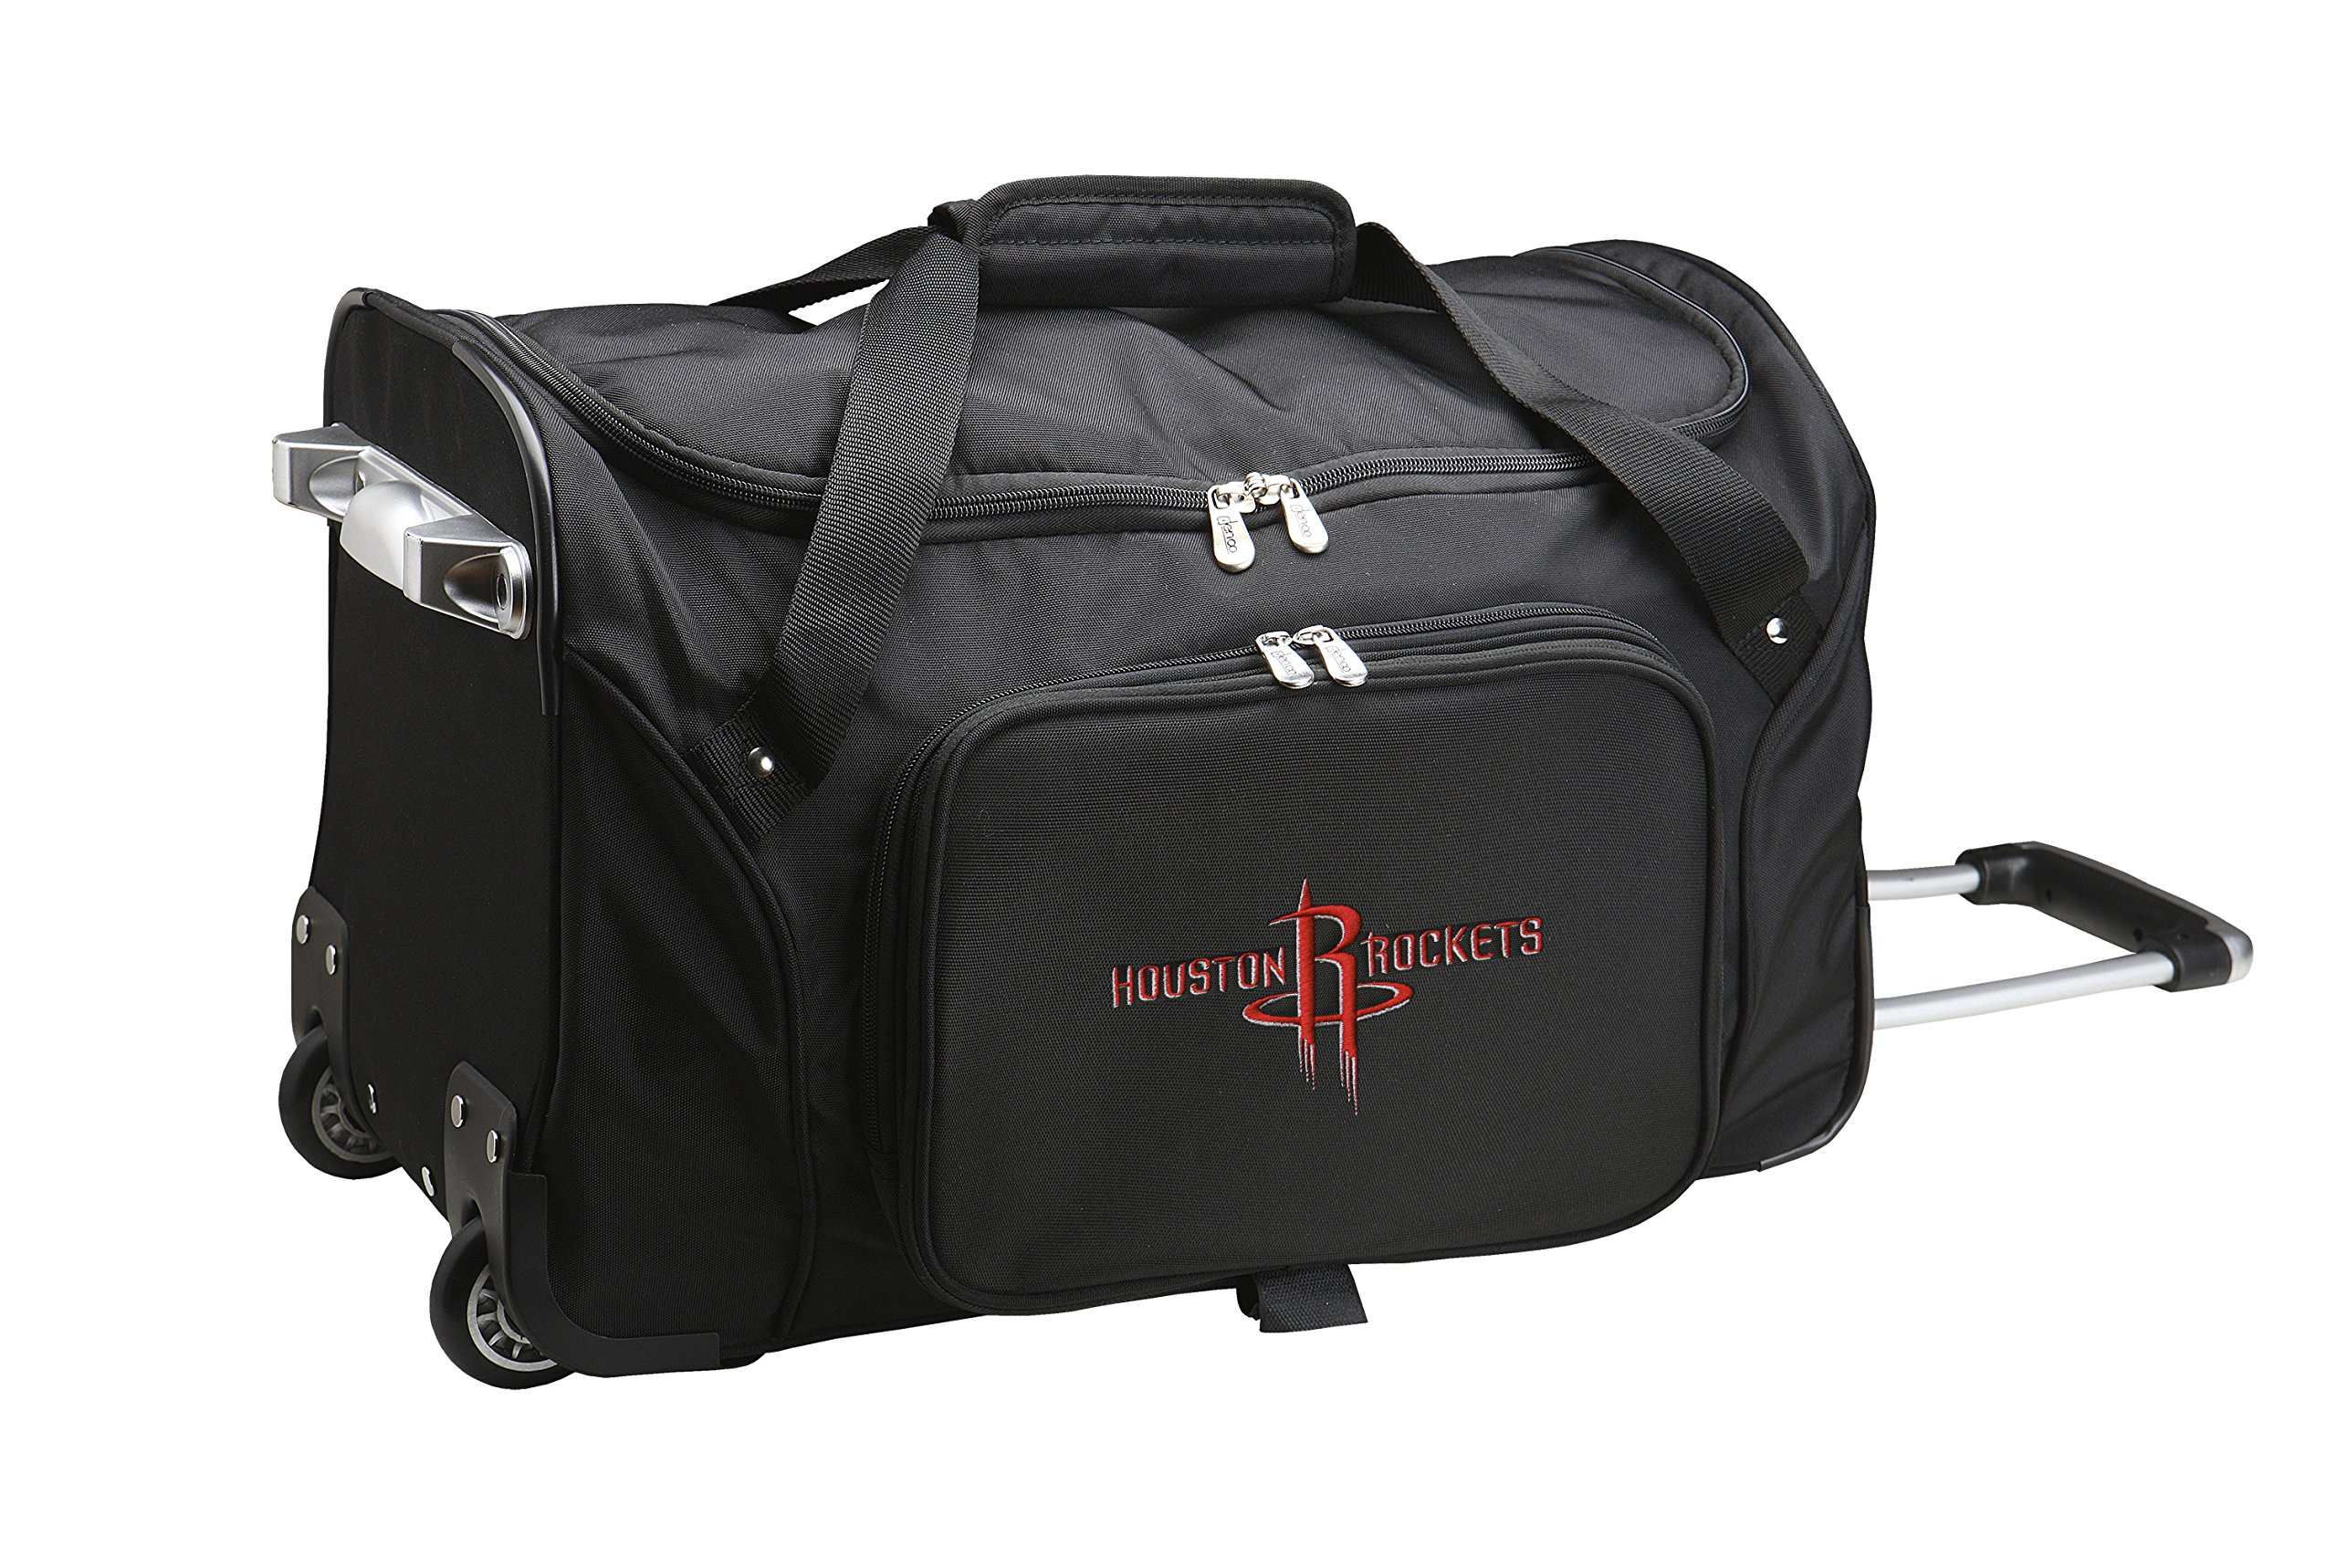 NBA Houston Rockets Wheeled Duffle Bag, 22 x 12 x 5.5'', Black by Denco